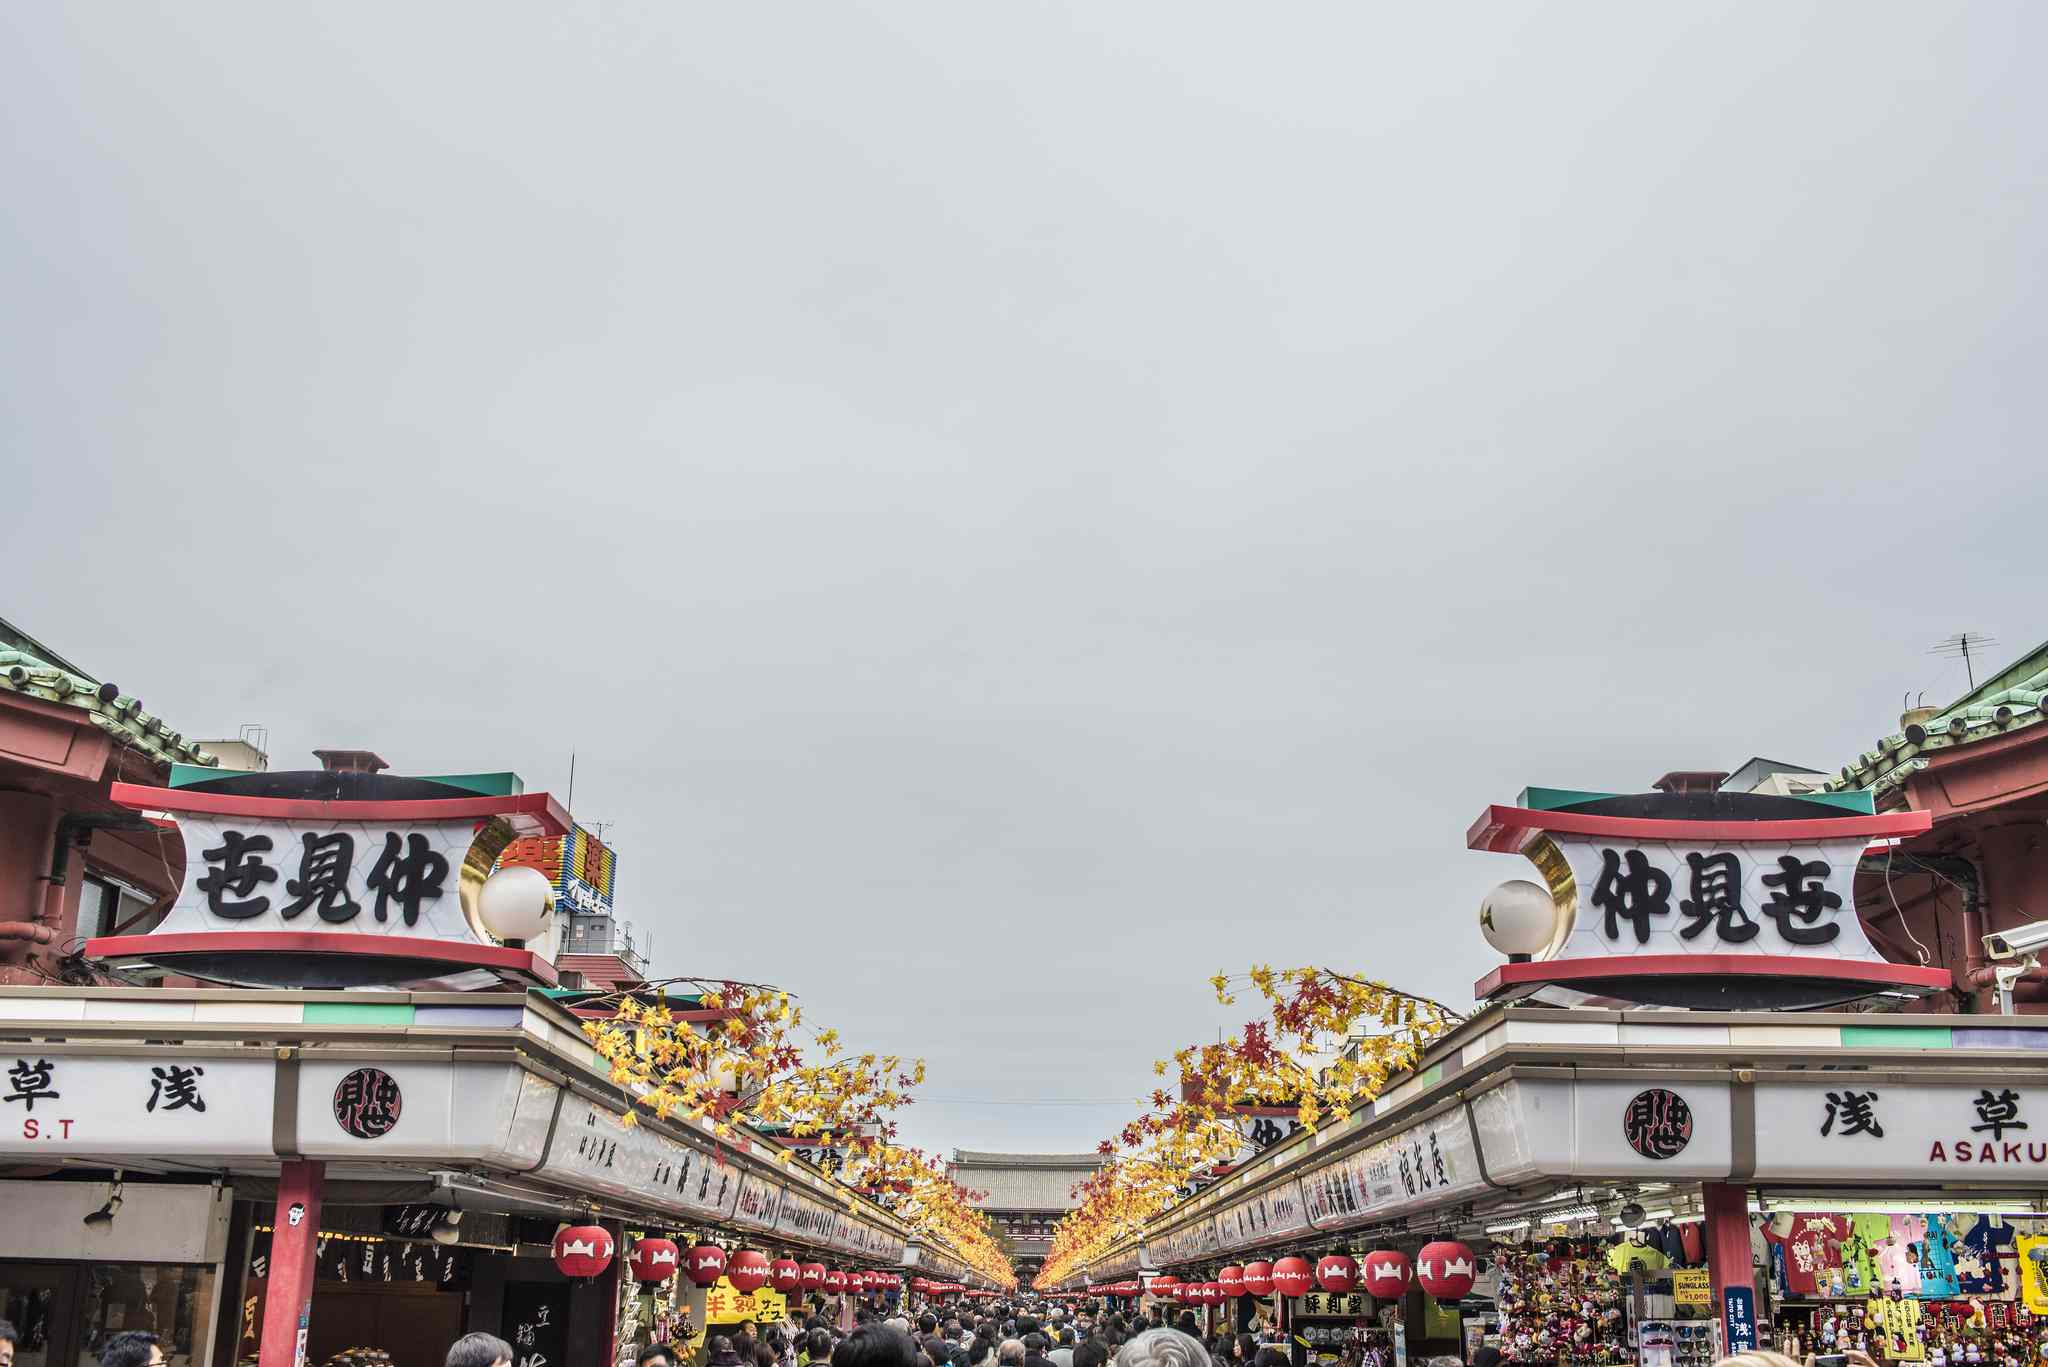 Asakusa Tourist Information